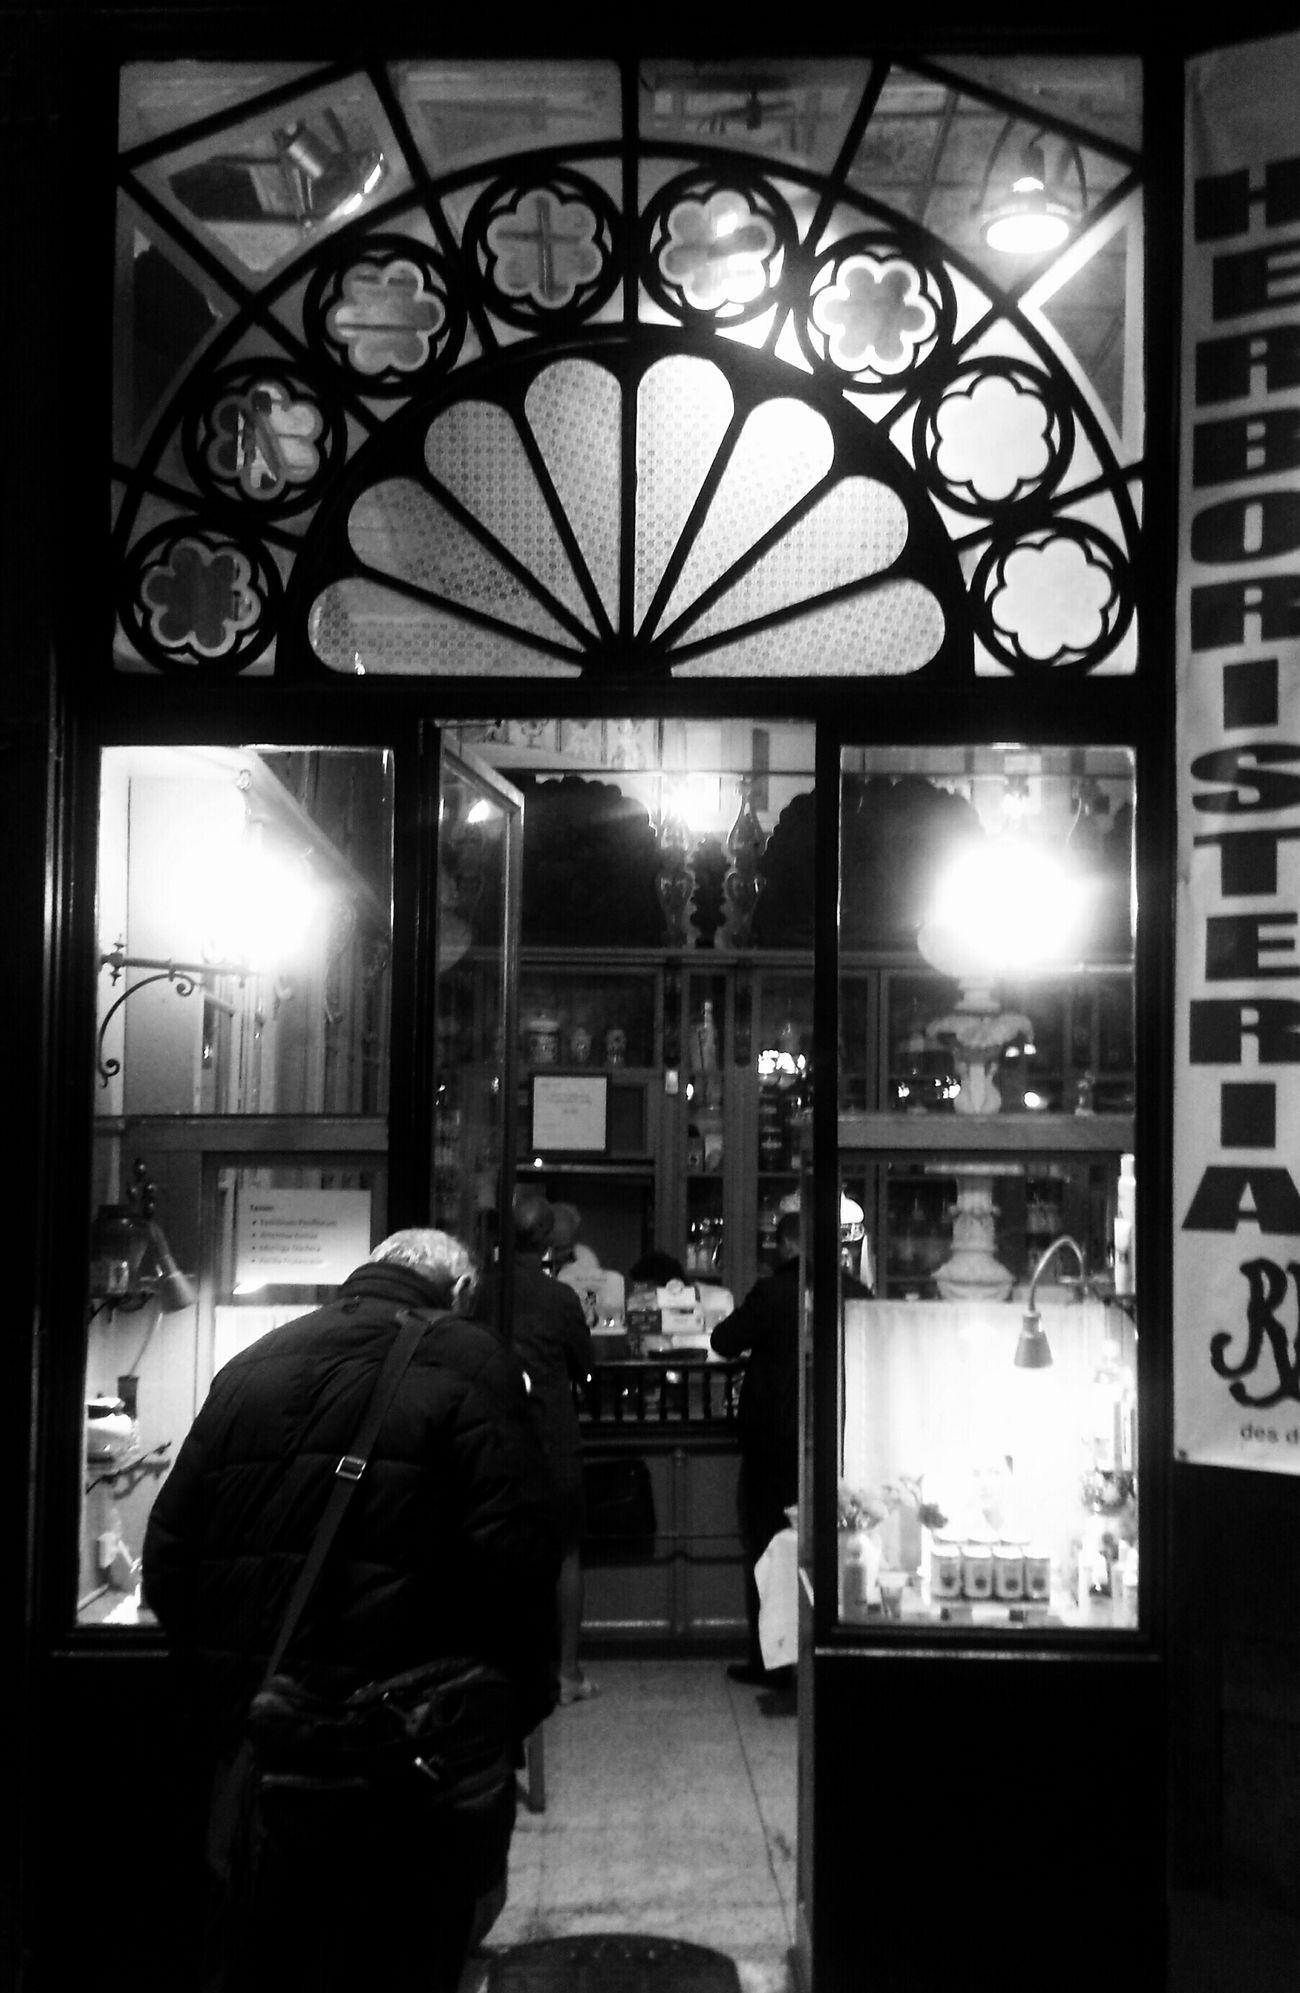 Mi Serie Barcelona Streetphotography Streetphoto_bw Light And Shadow Shades Of Grey